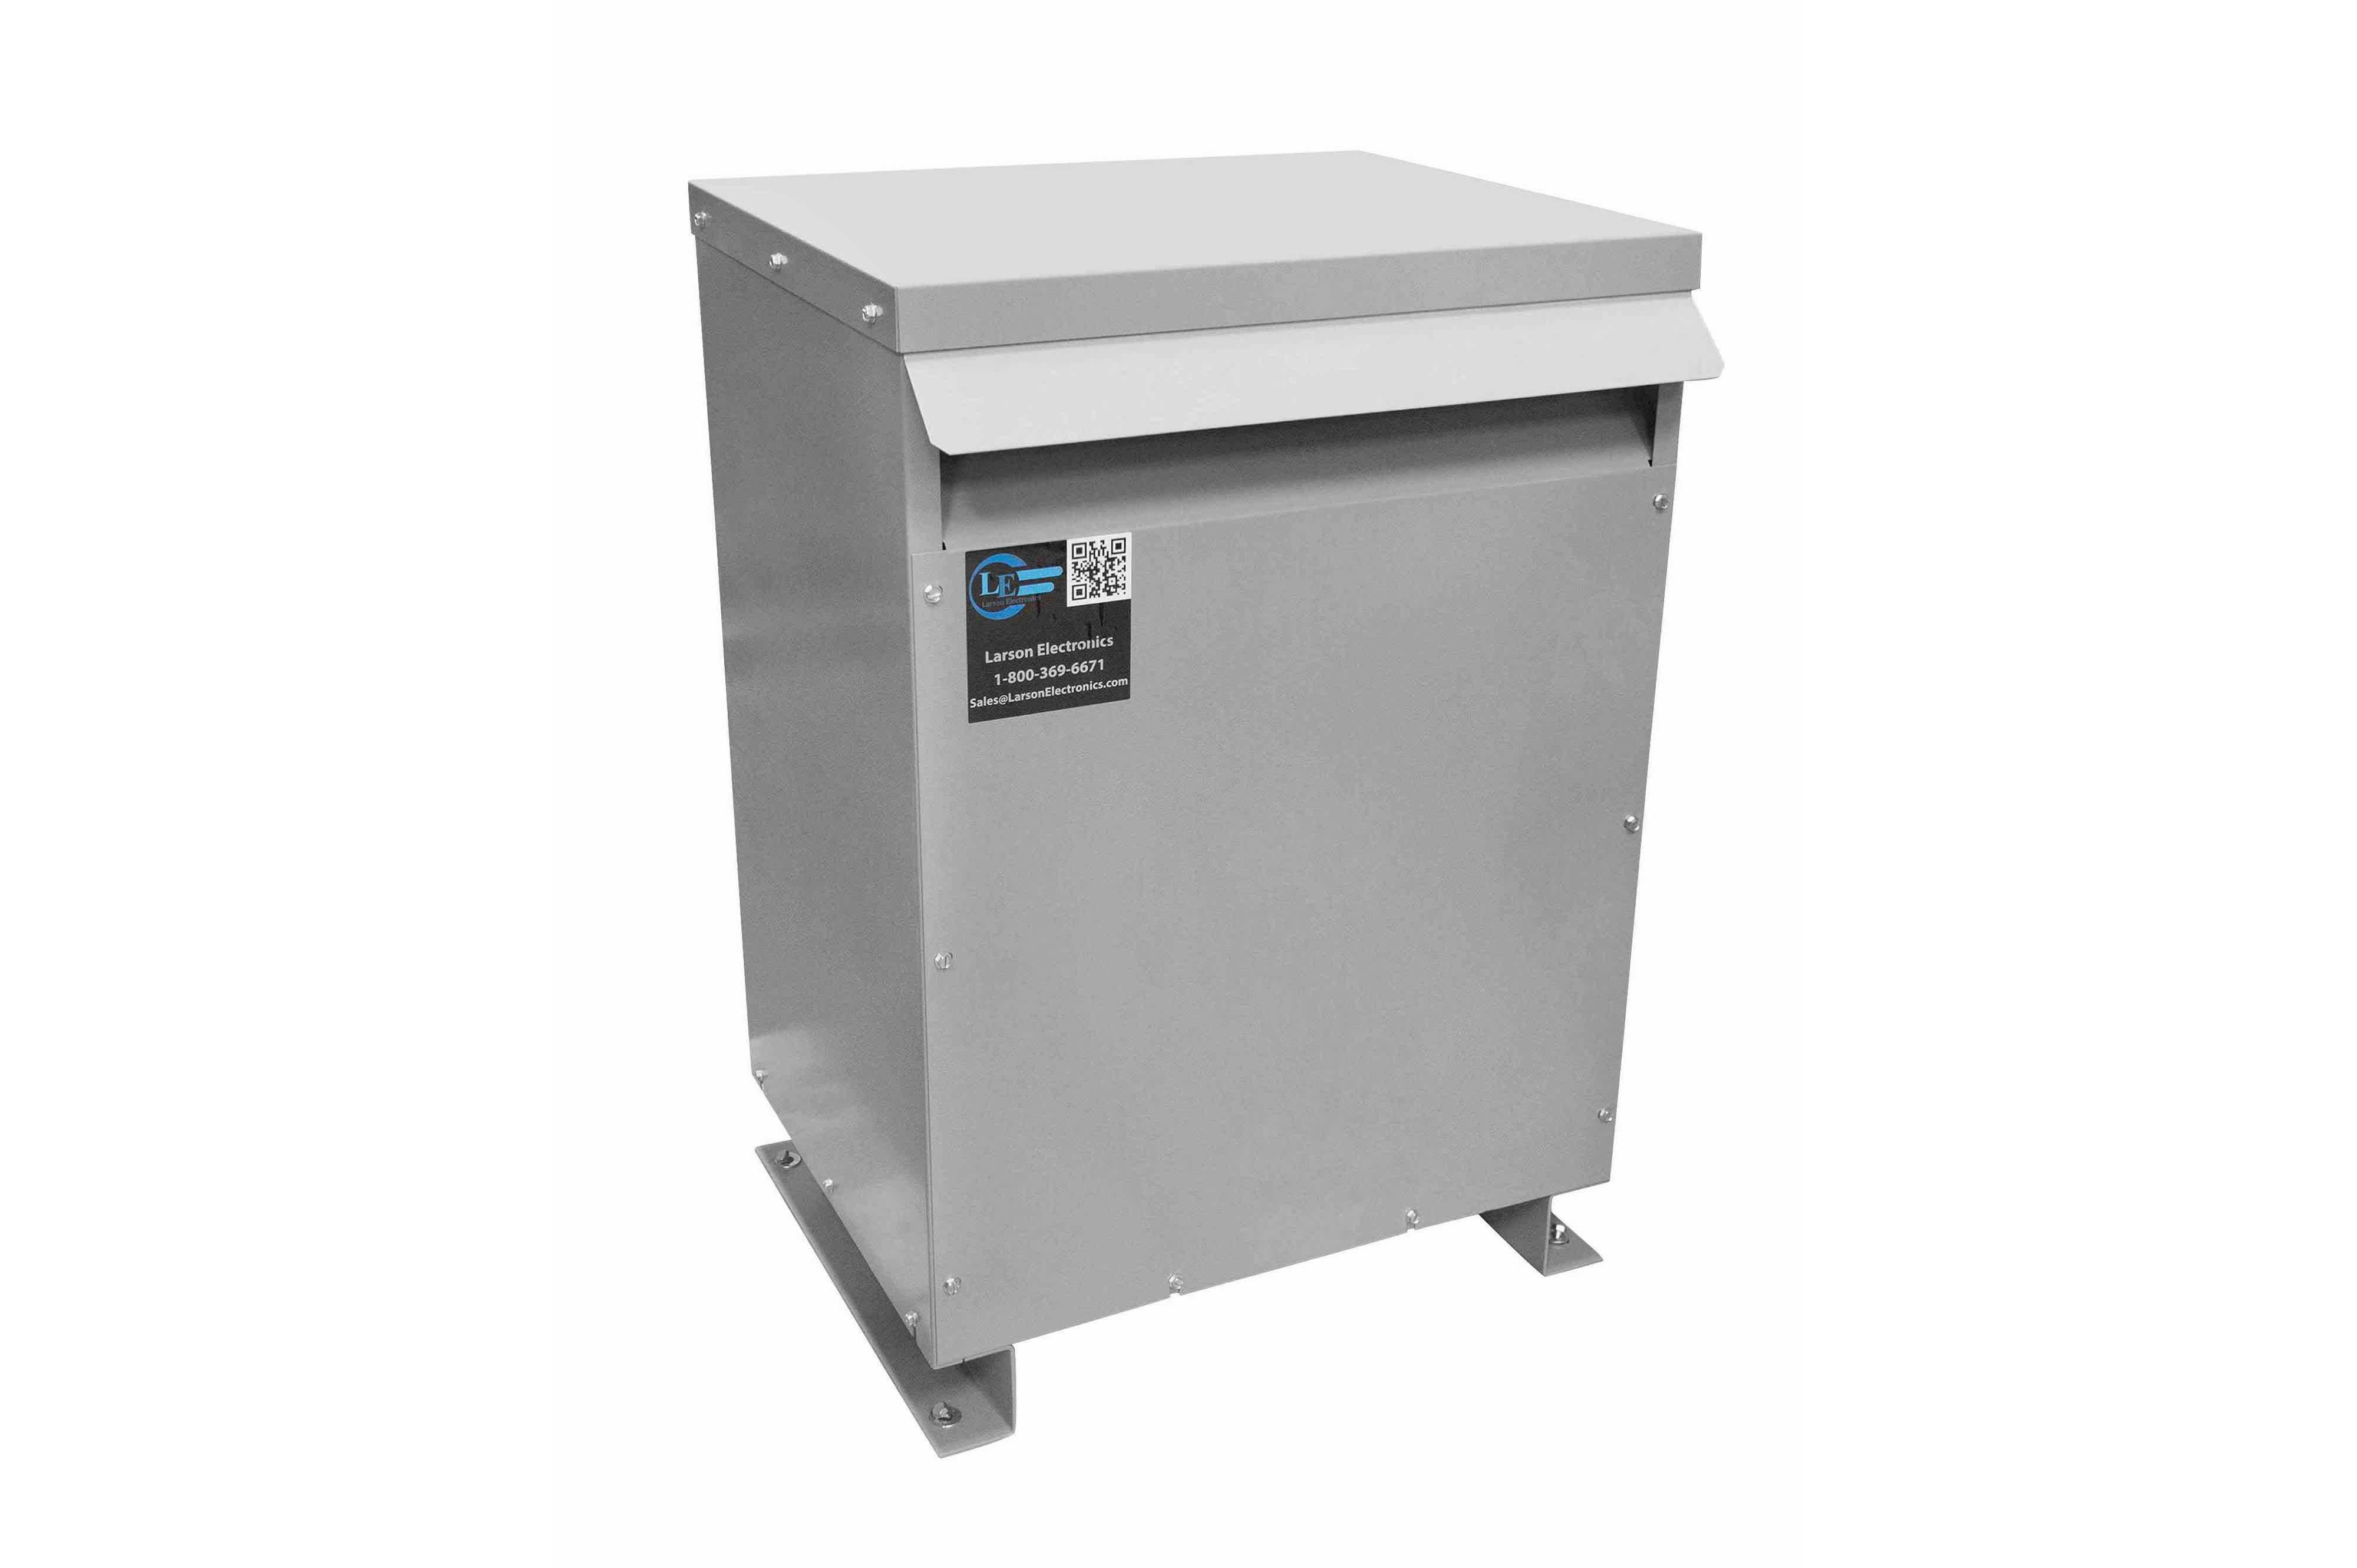 36 kVA 3PH Isolation Transformer, 400V Wye Primary, 240V Delta Secondary, N3R, Ventilated, 60 Hz